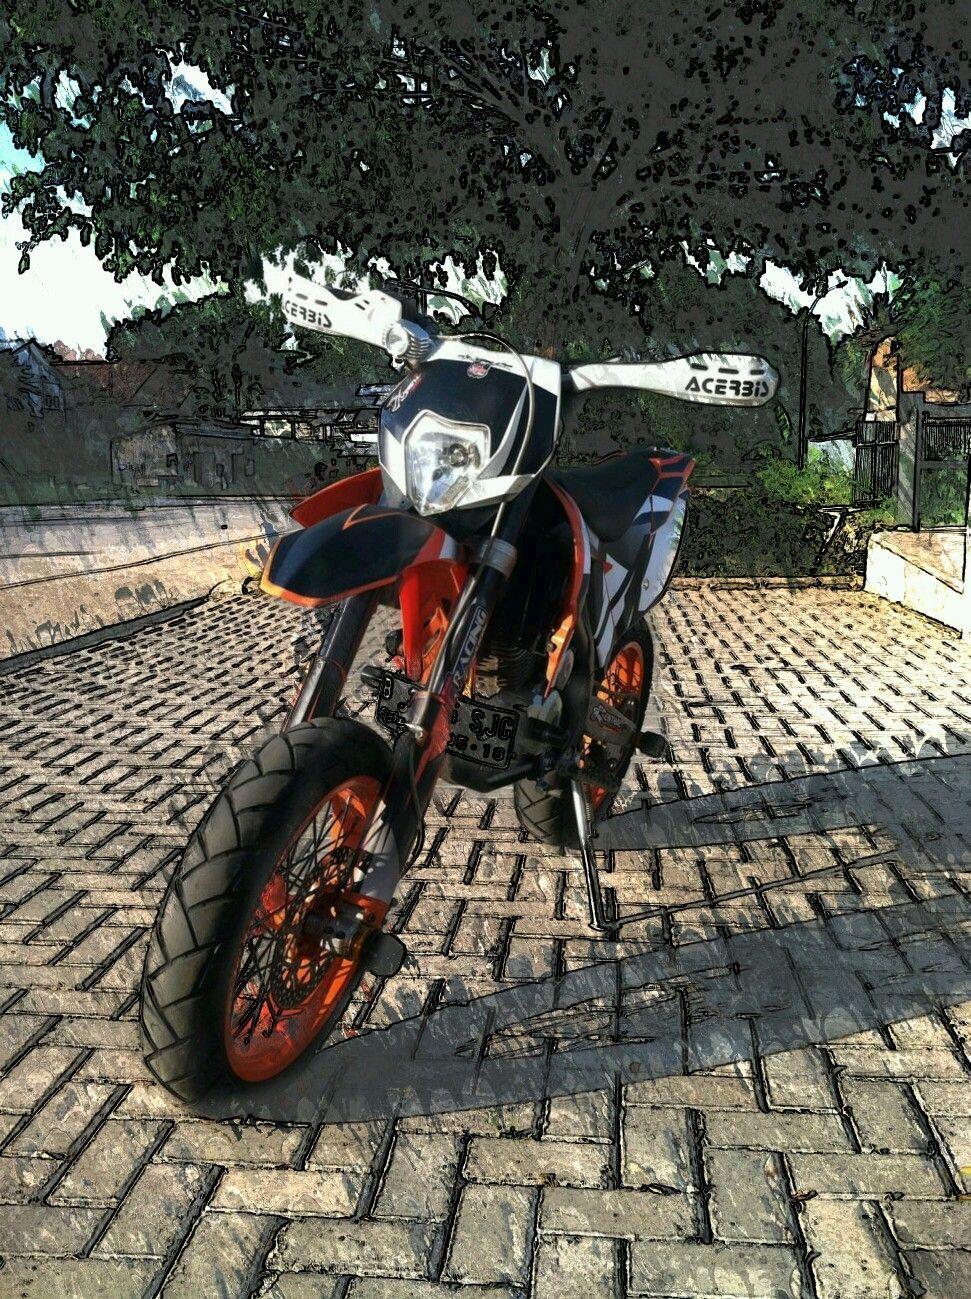 Supermoto ktm 690 stunt concept bikemotorcycletuned car tuning car - Ktm 690